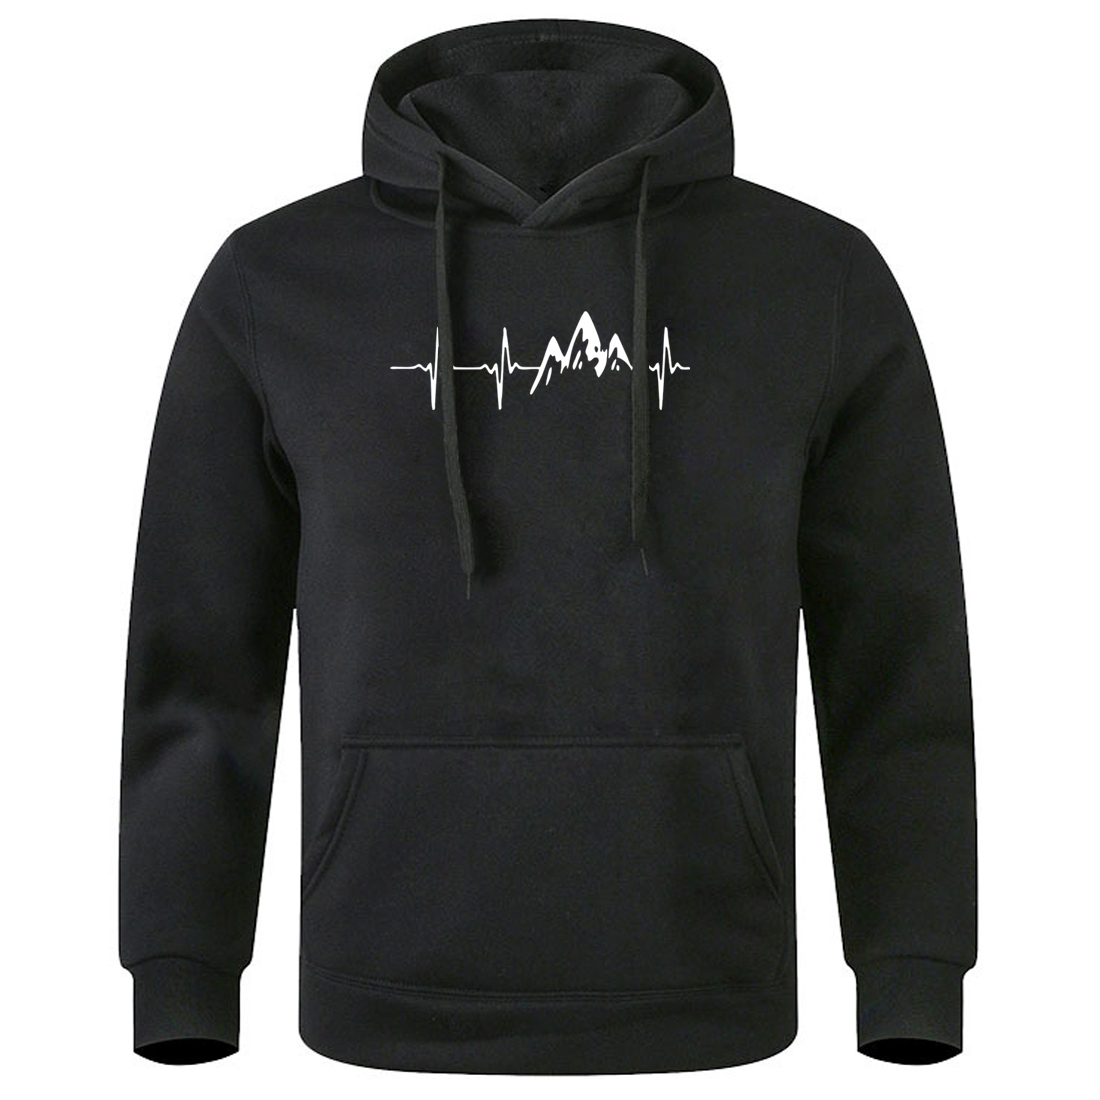 Winter Coat Men's Tracksuit Electrocardiogram Love Print Clothes Man Warm Brief Hooded Harajuku Sweatshirts Men Top Hoodies